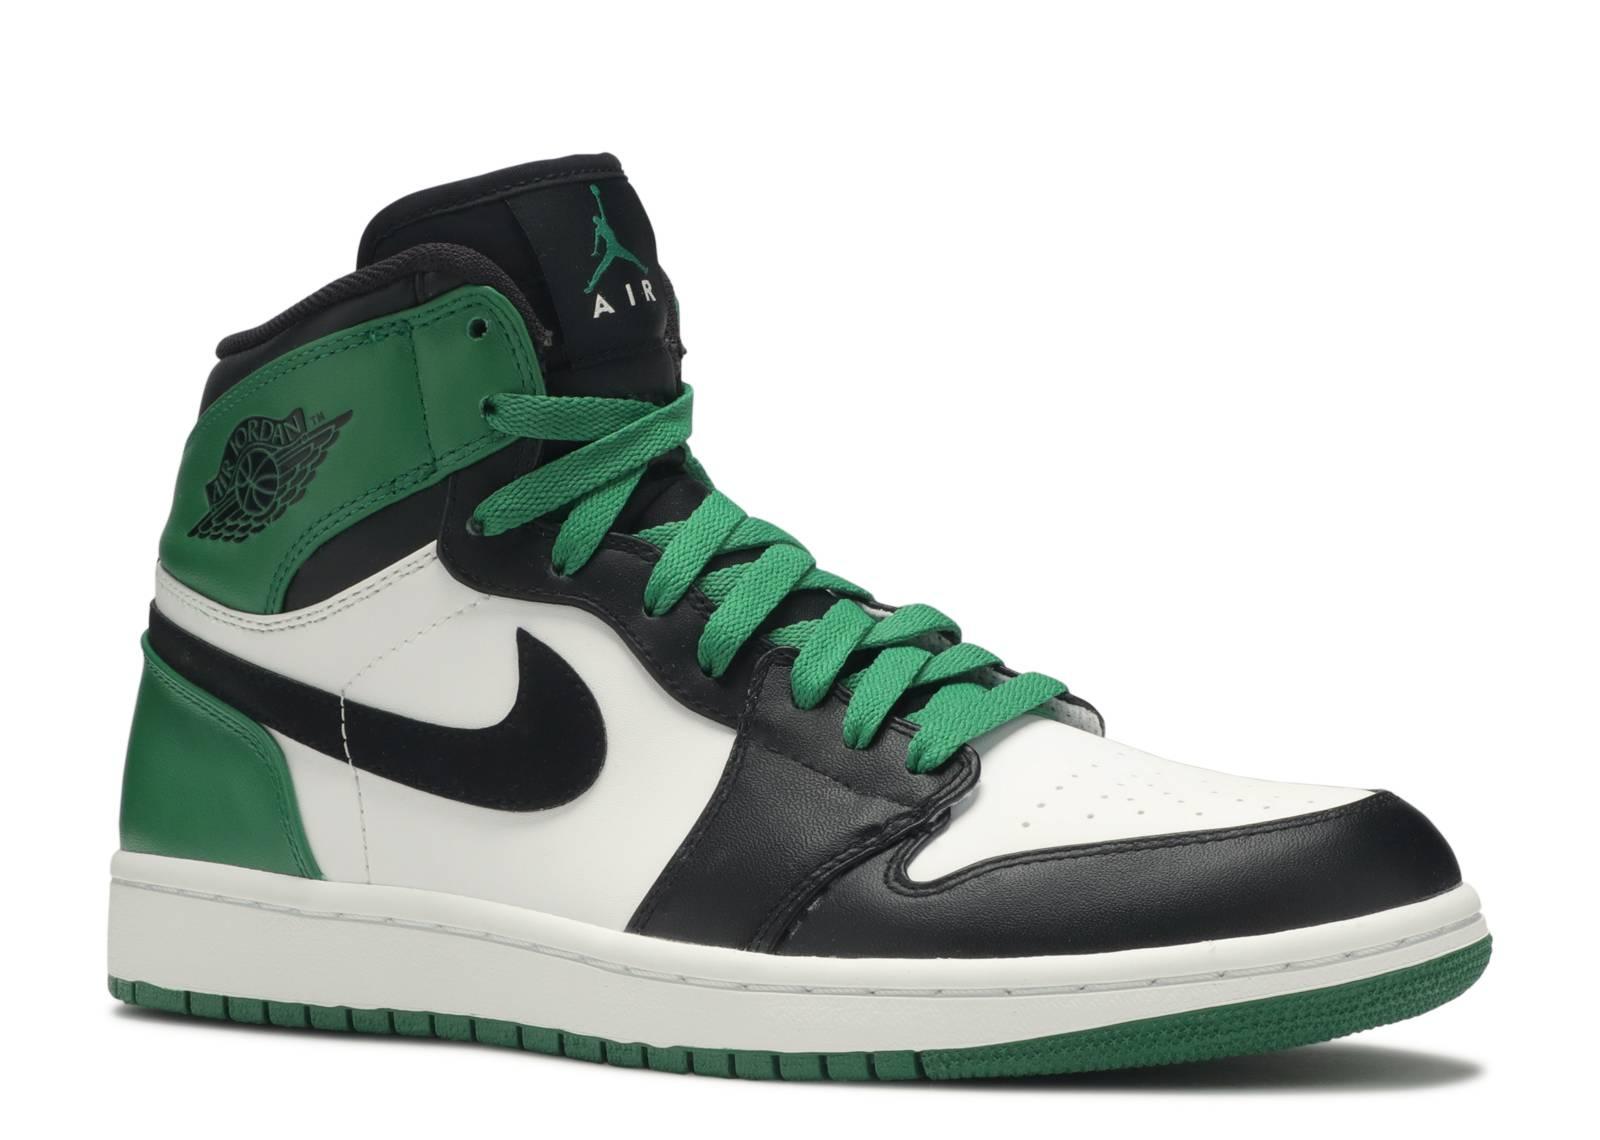 b96226b4e7a6 ... Black Cyan air jordan retro 1 white green ...